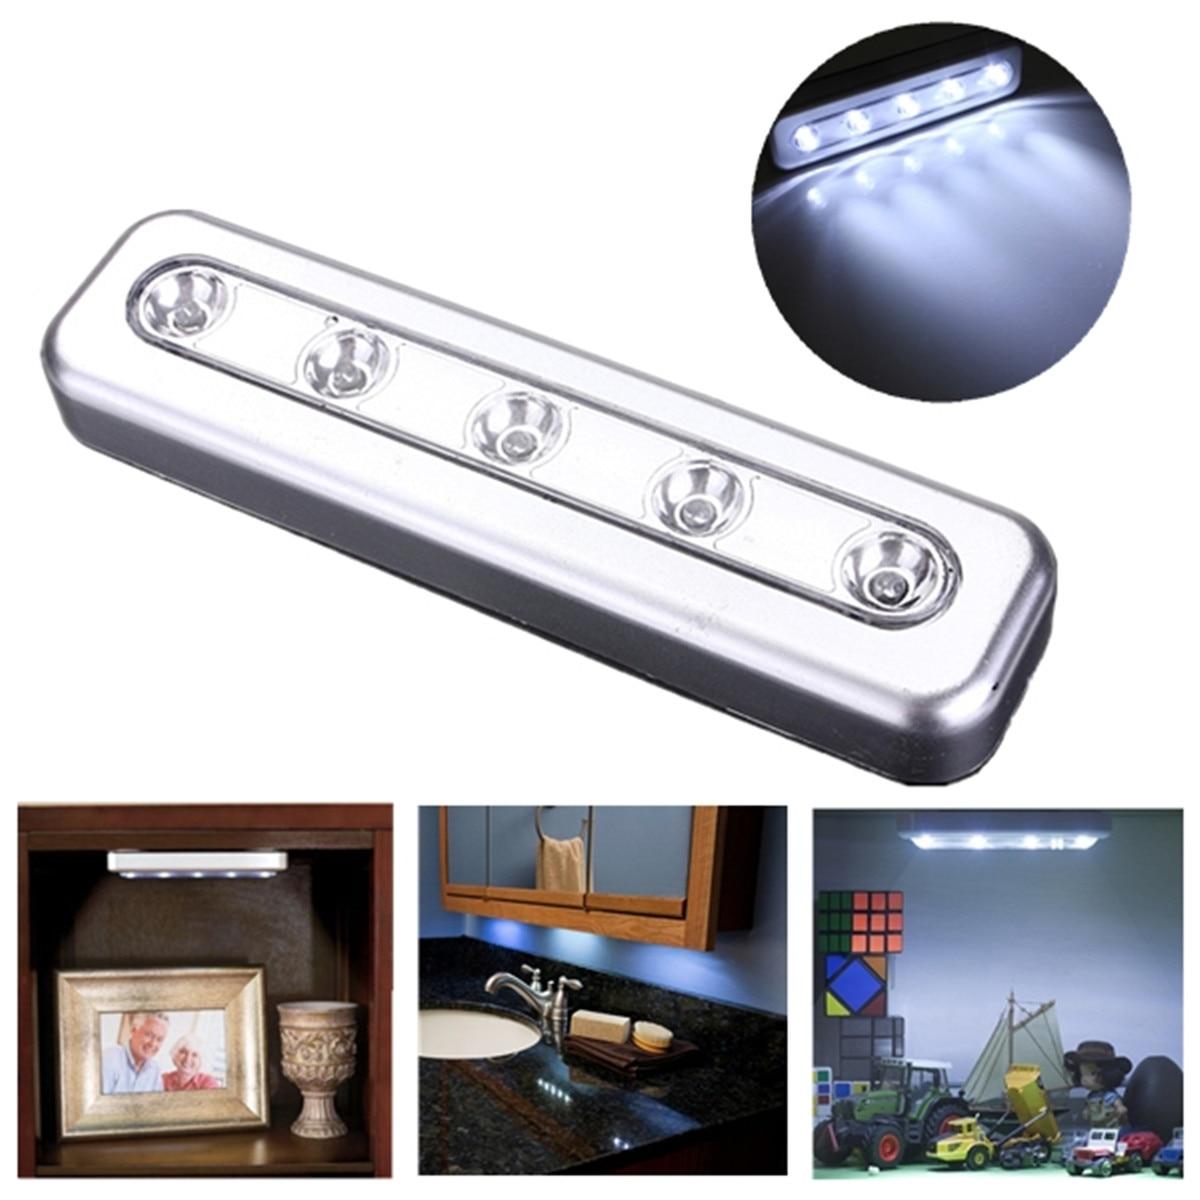 5 LED Self Stick Tap Light Tube Under Cabinet Push